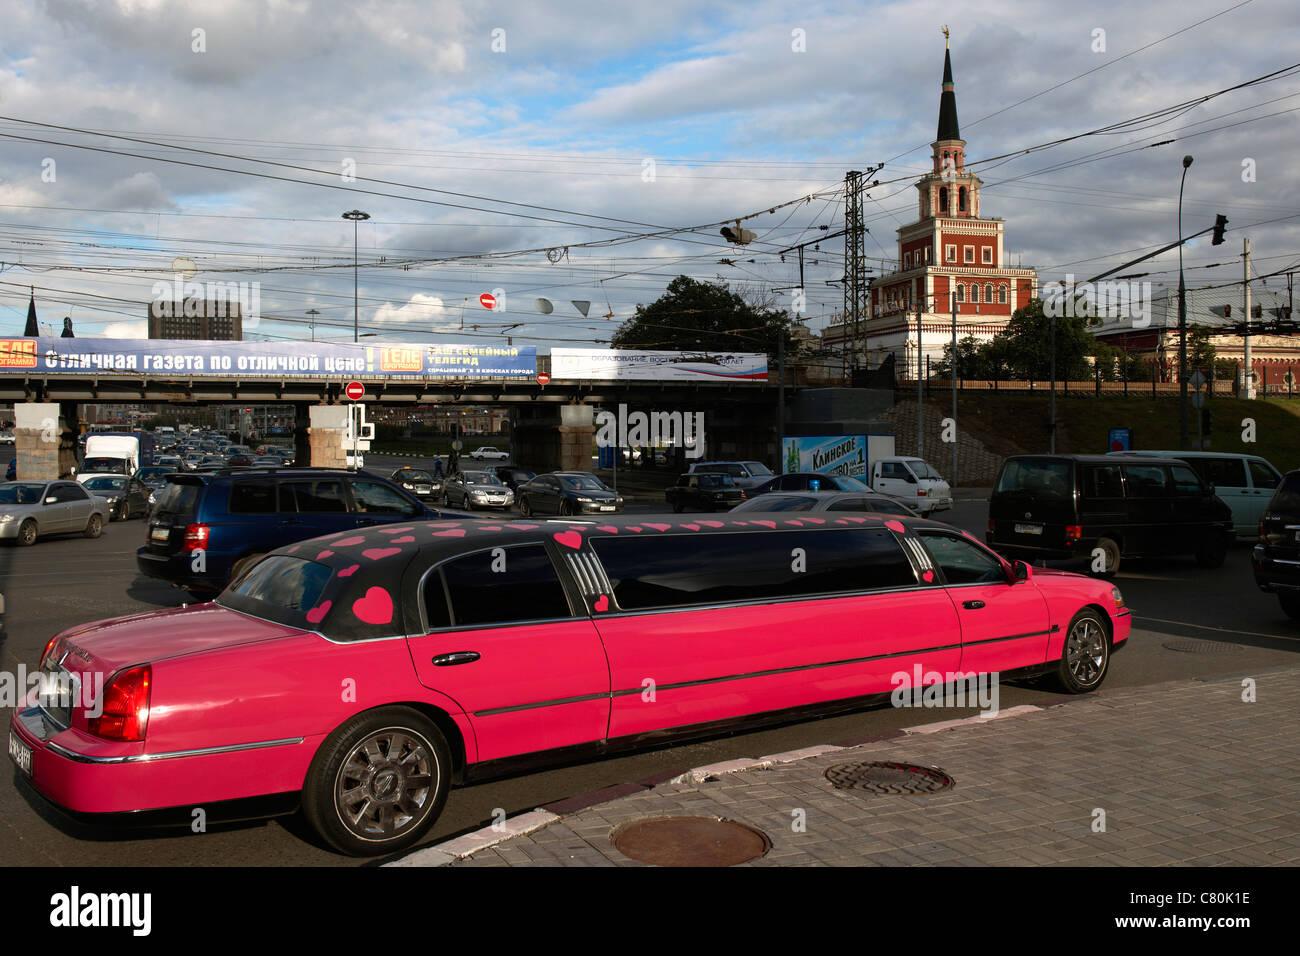 Russia, Moscow, Kazansky Train Station, Limousine Car - Stock Image